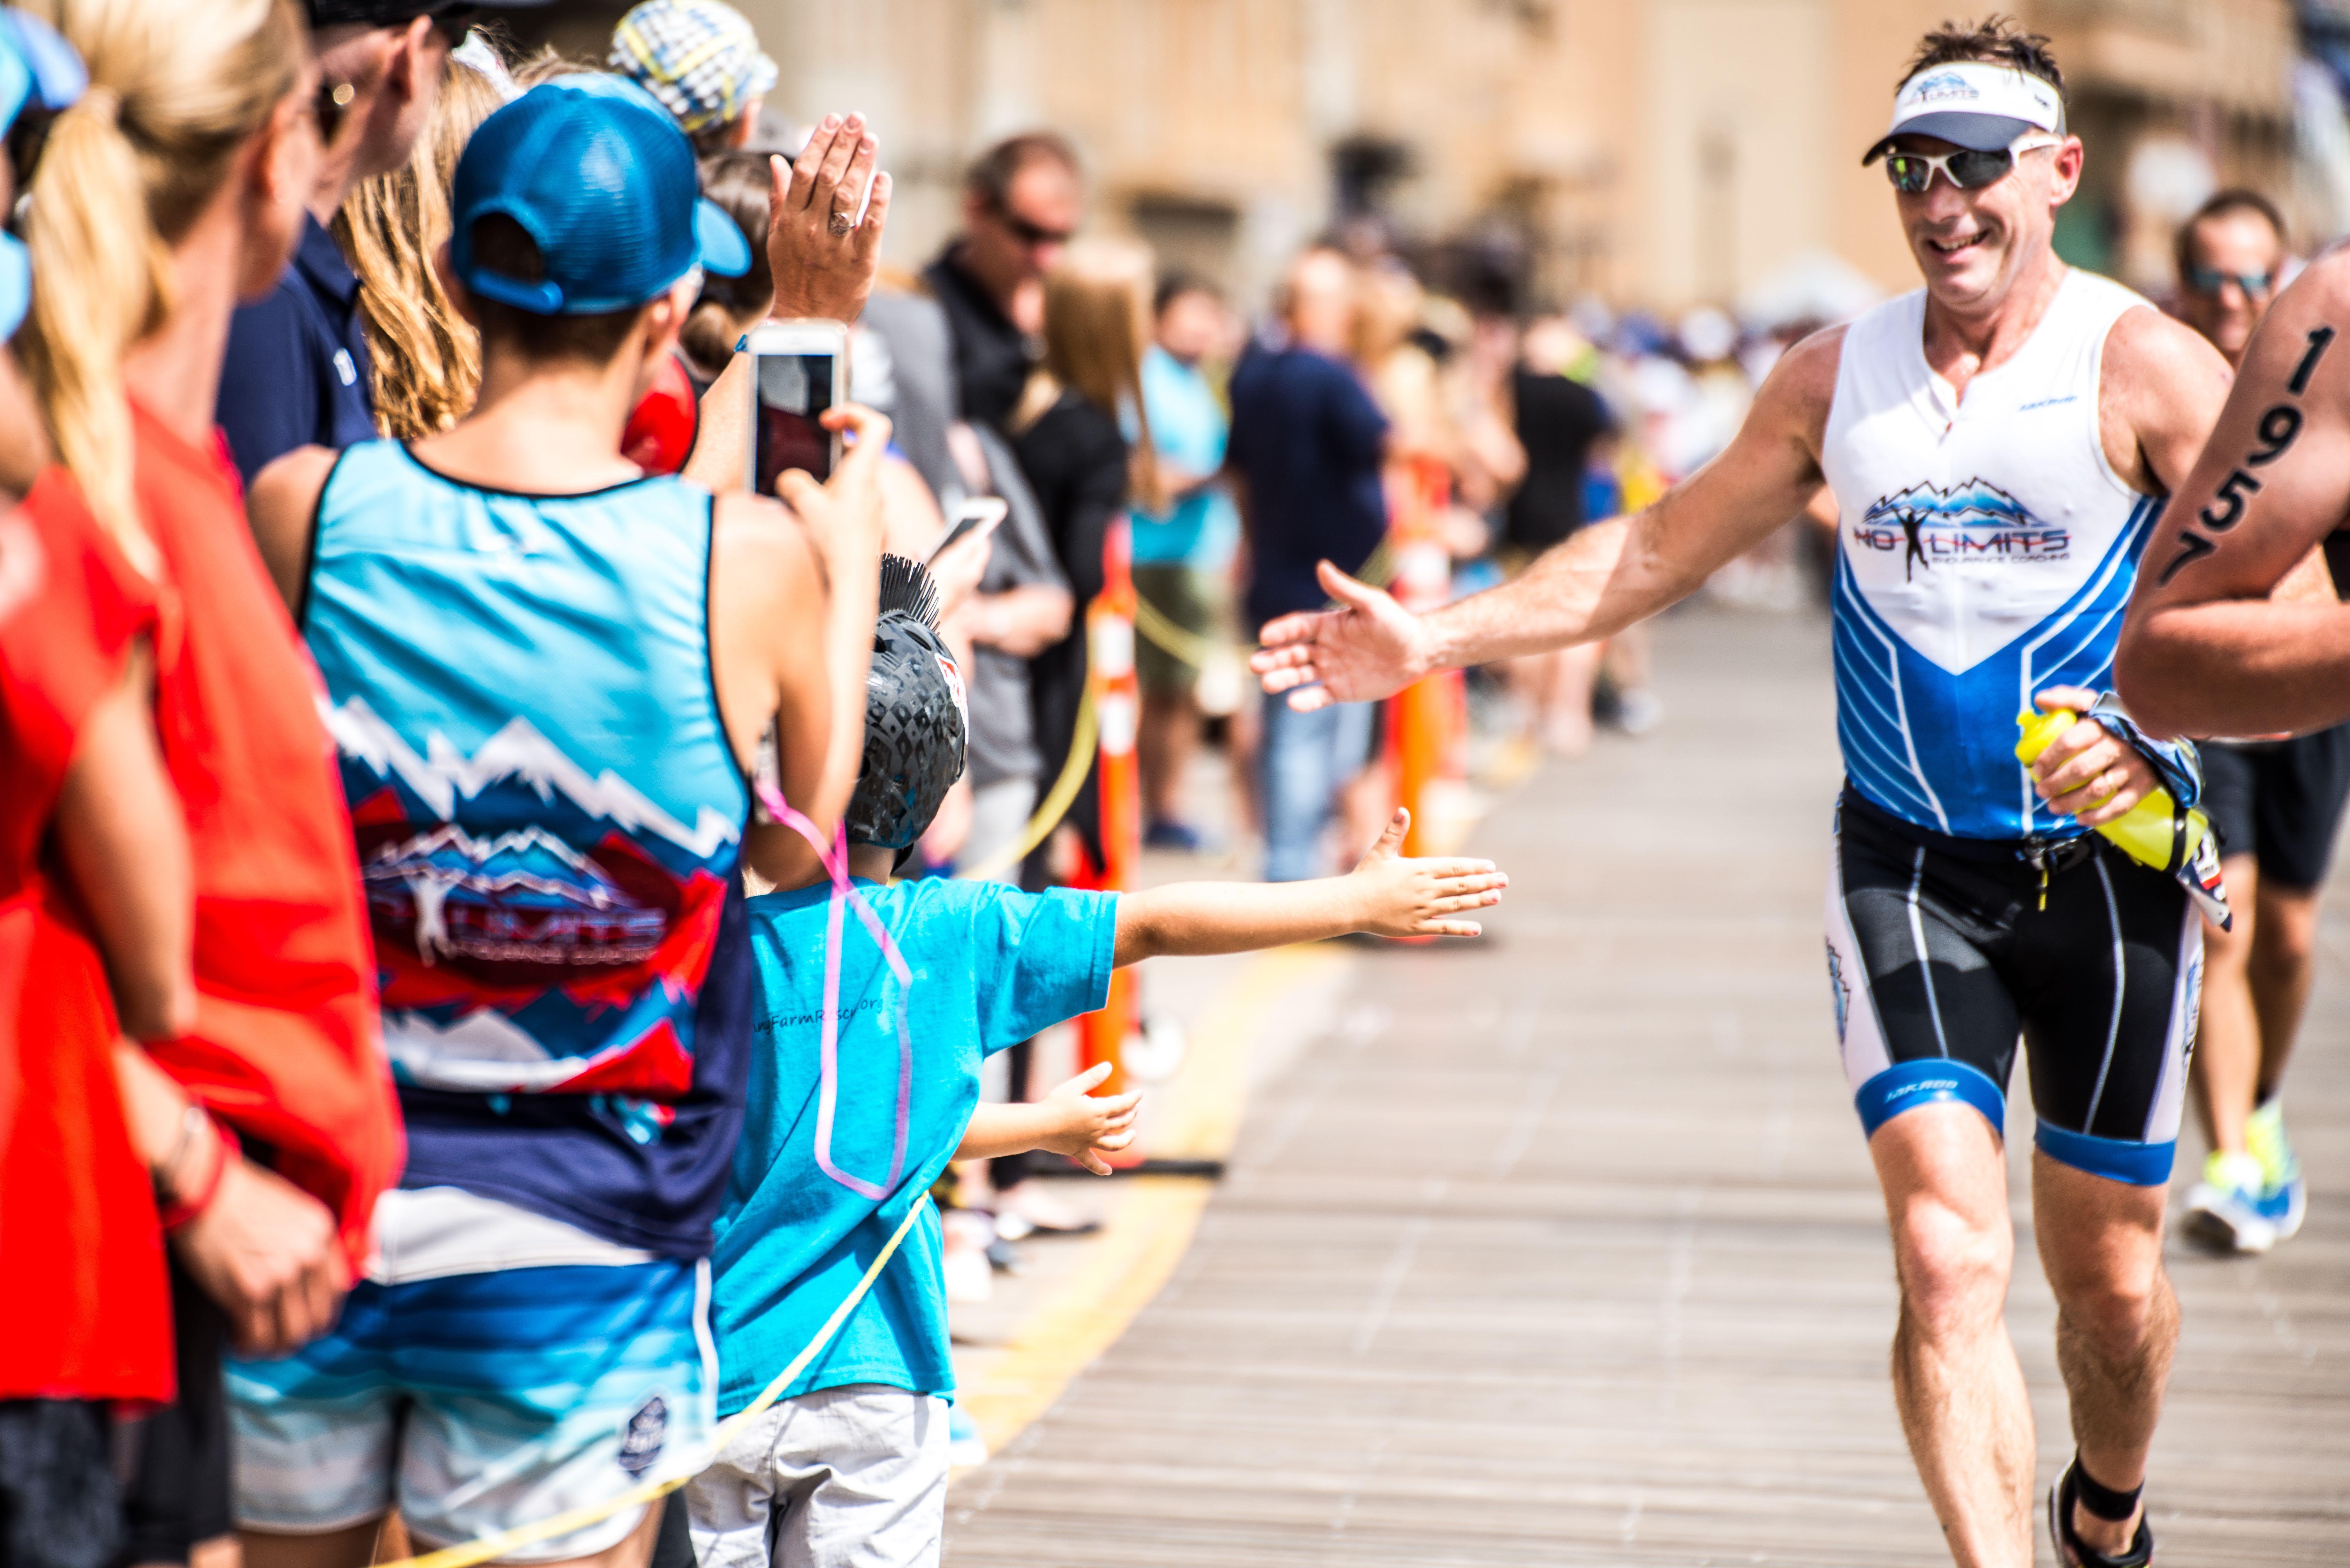 boardwalk - Ironman 70.3 Atlantic City